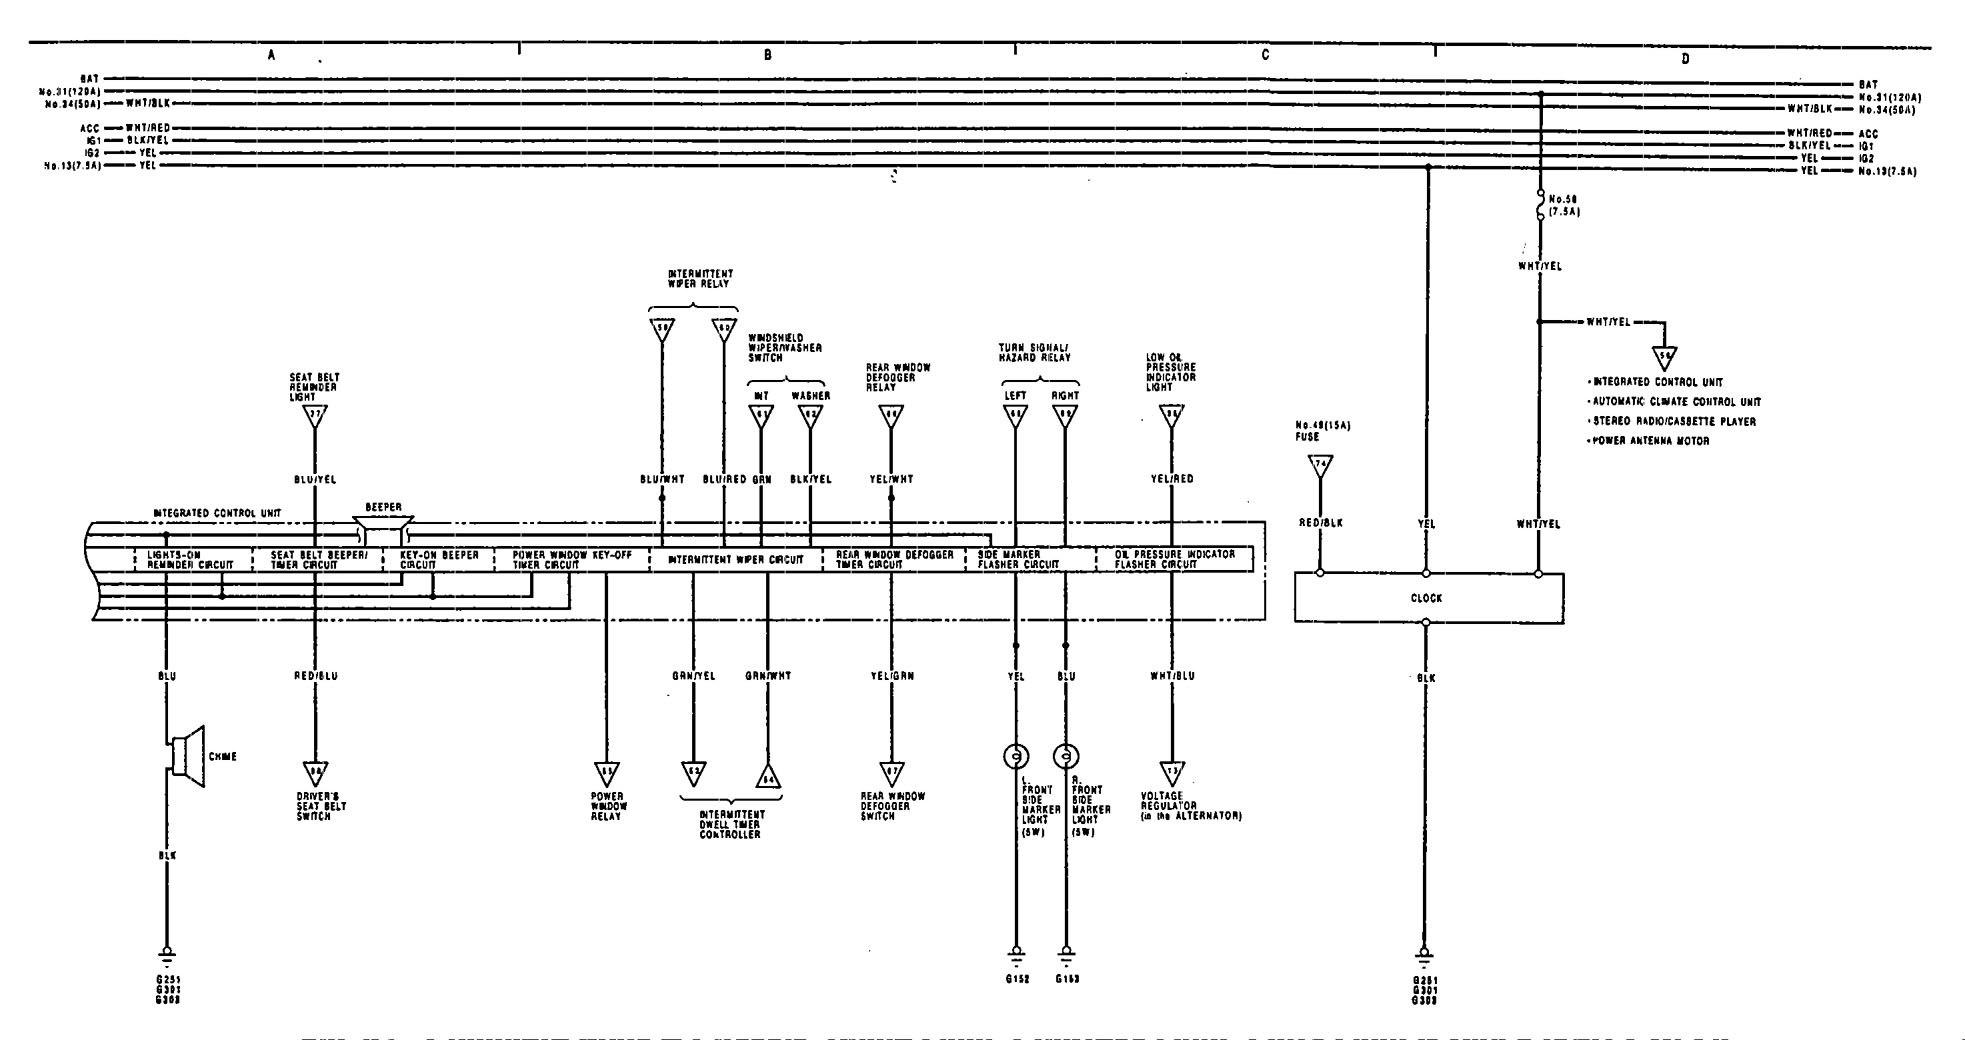 2005 Gmc Canyon Heater Blower Wiring Diagram. Gmc. Auto